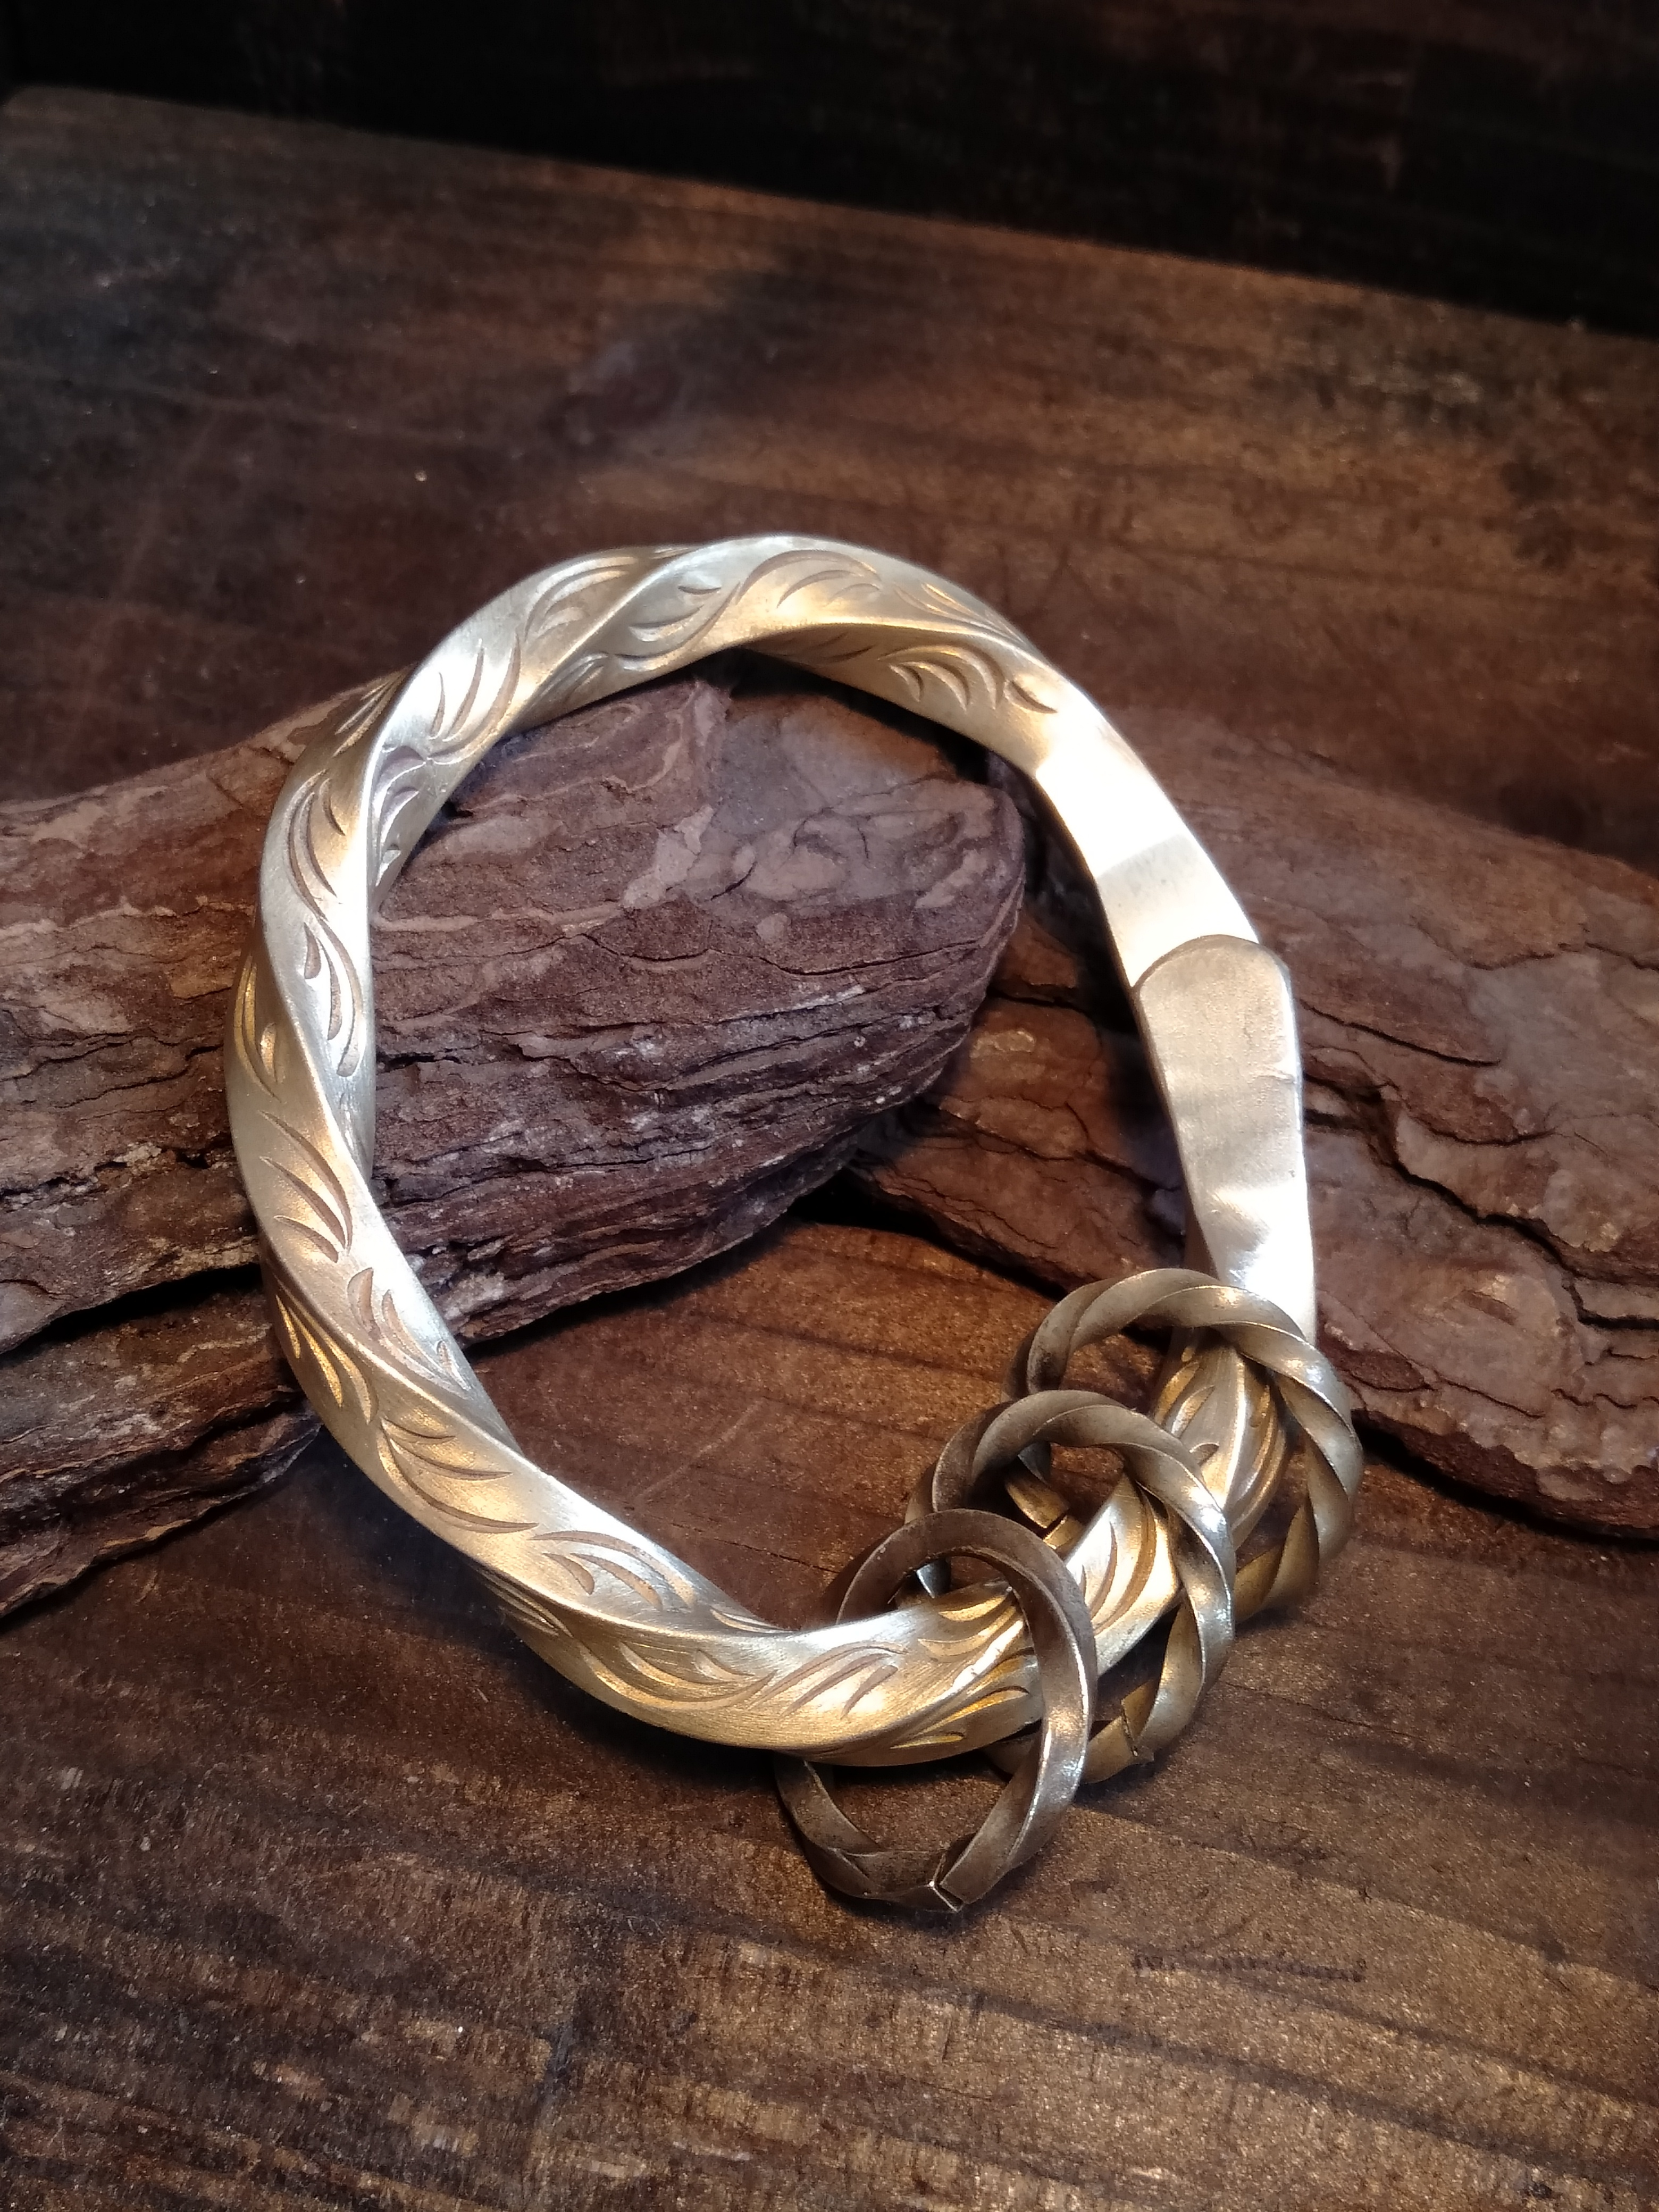 Arabesque Twist Oval Key Ring - 唐草彫りツイストオーバルキーリング